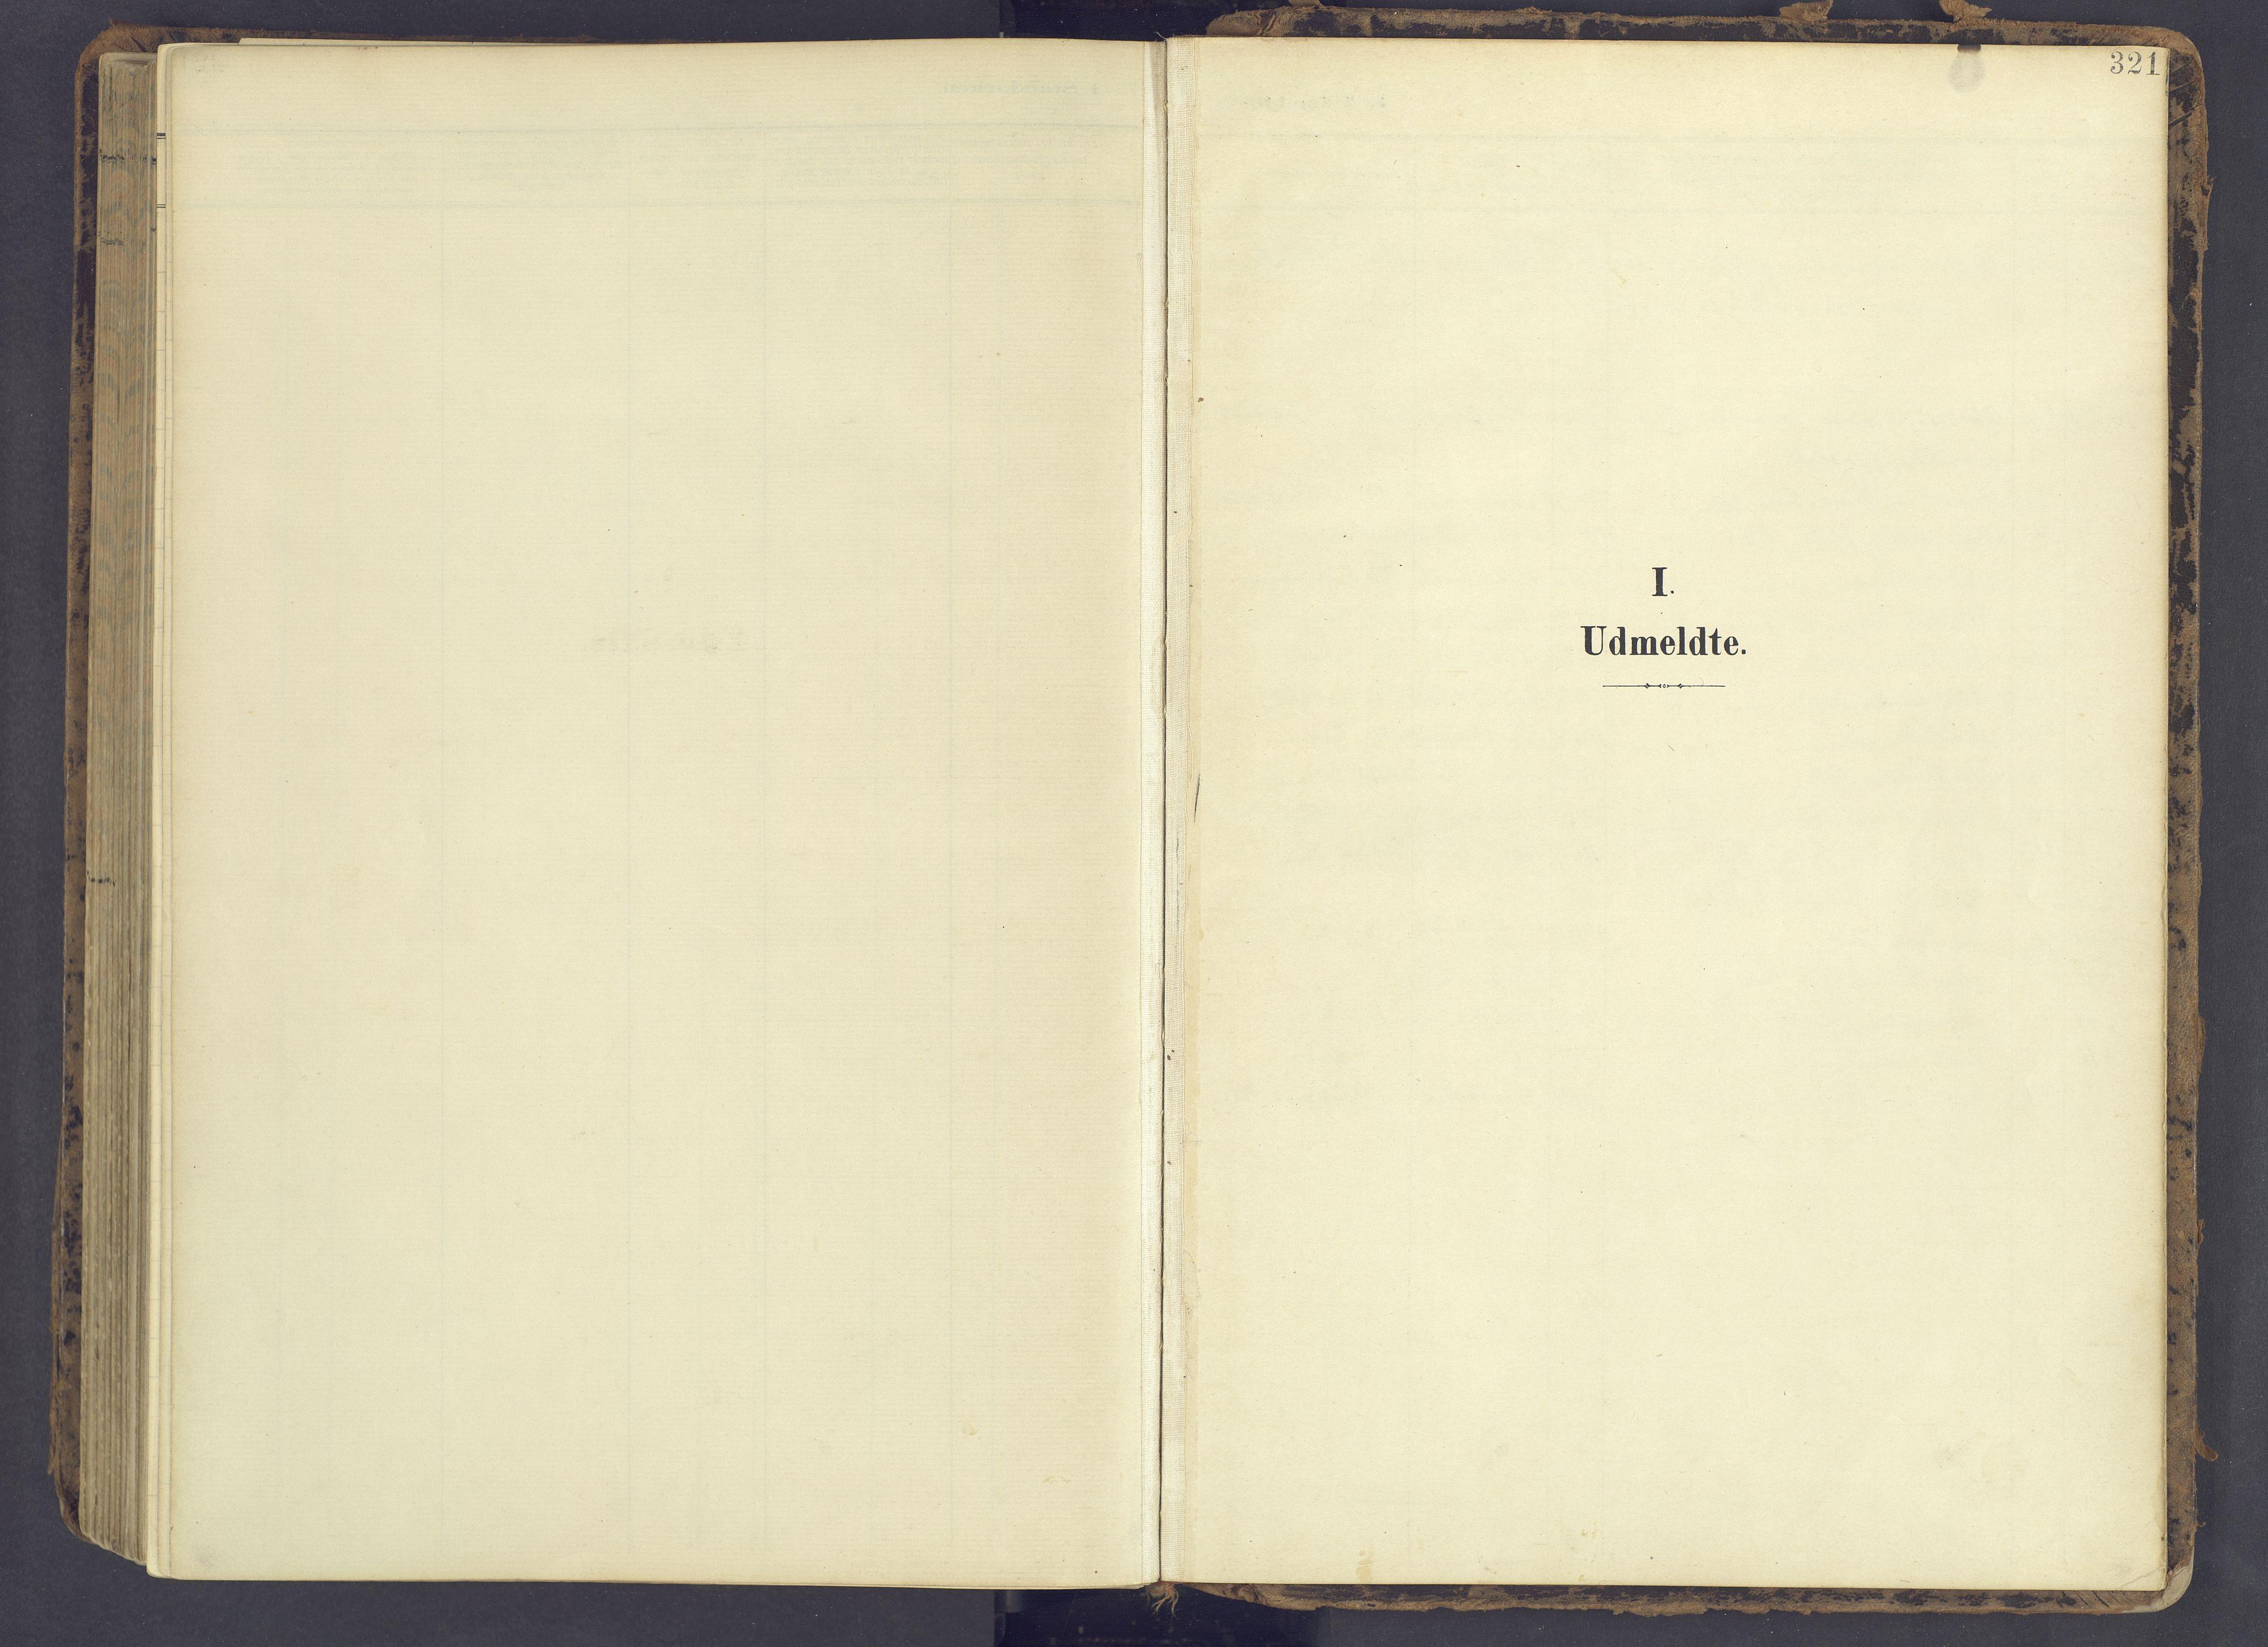 SAH, Fåberg prestekontor, Ministerialbok nr. 12, 1899-1915, s. 321